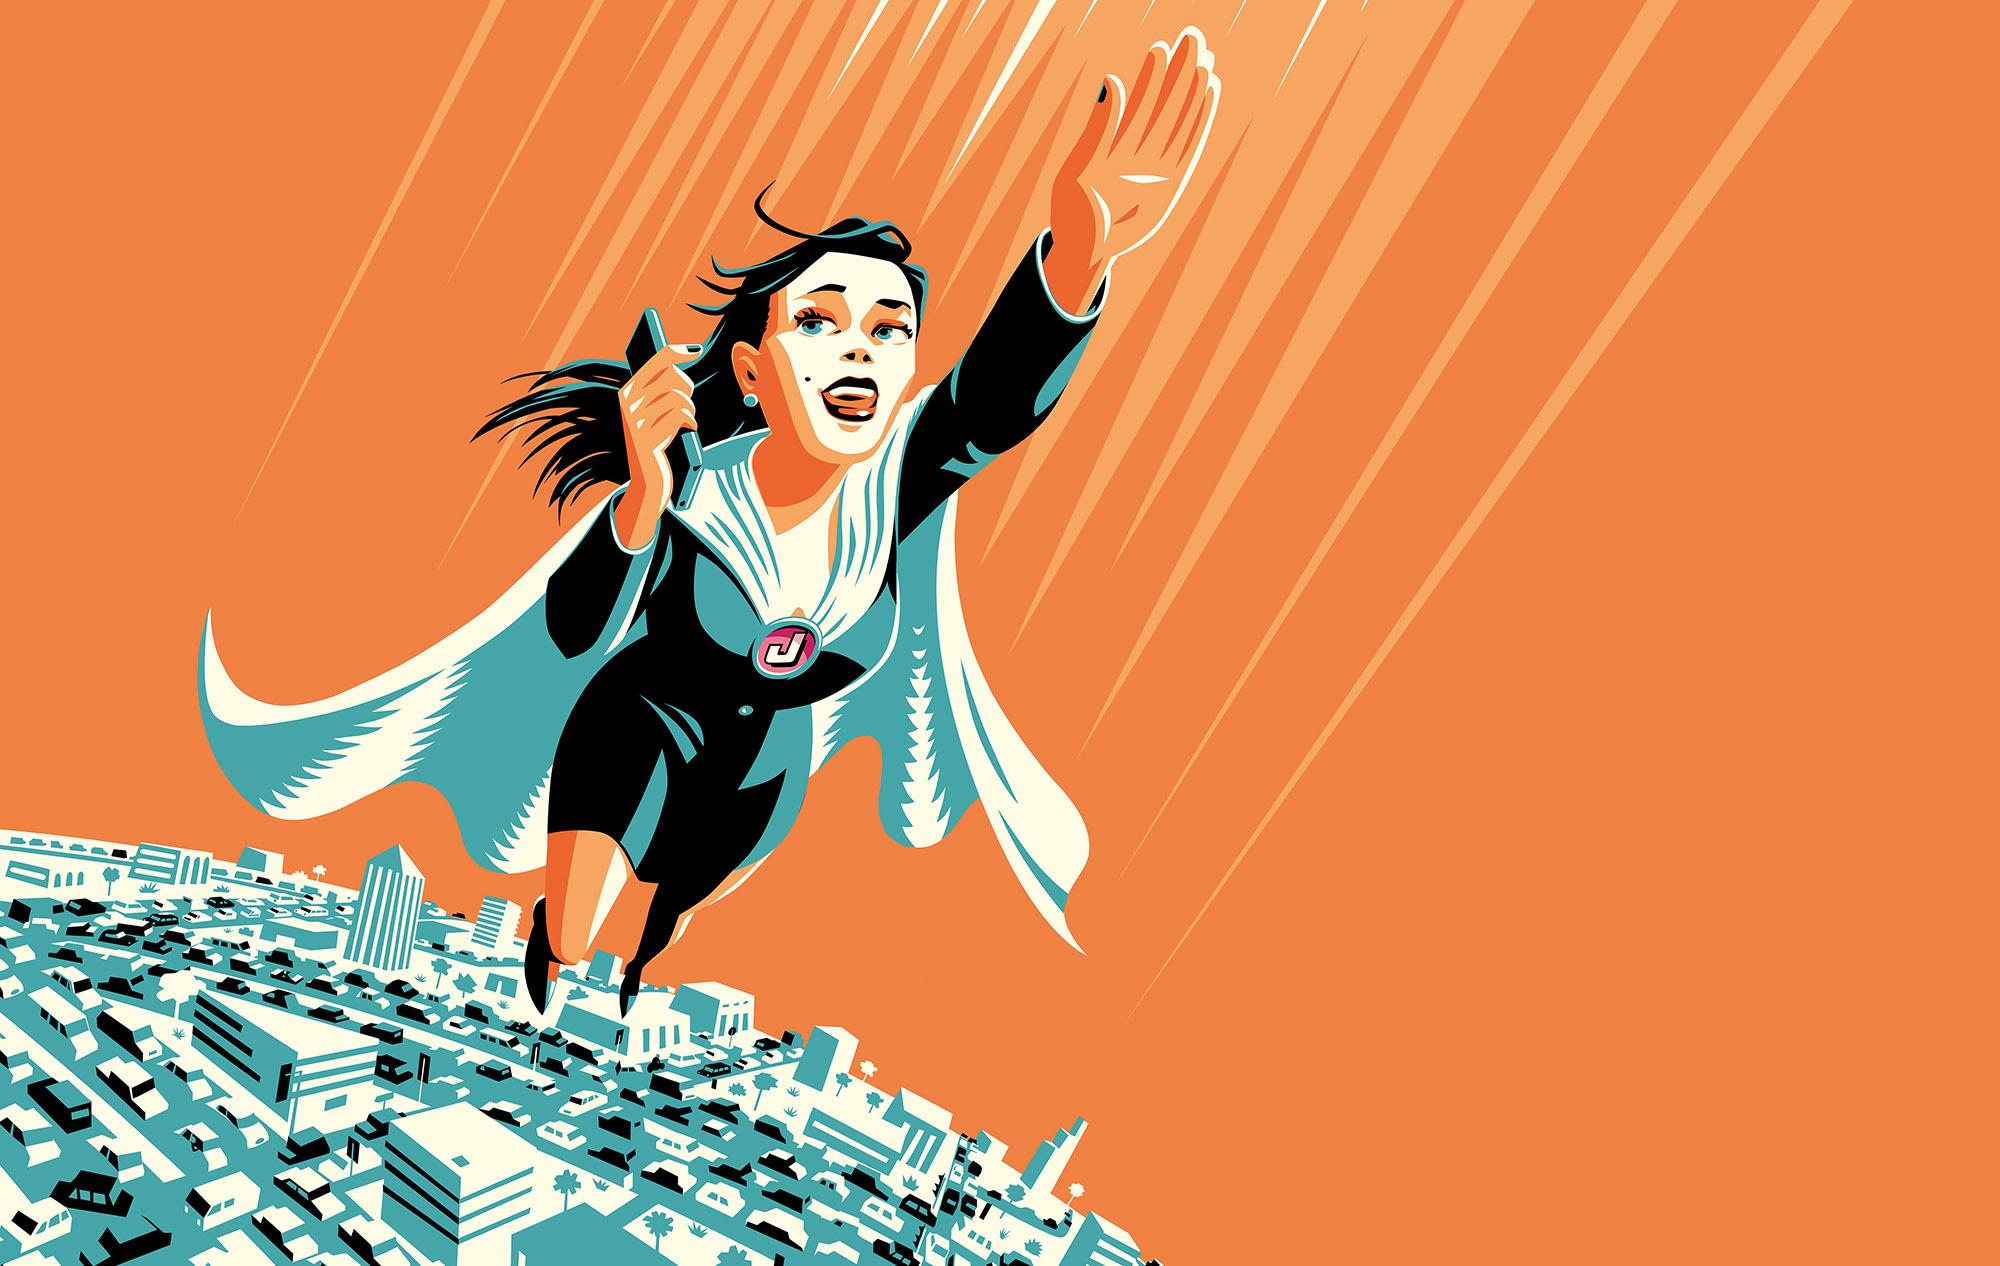 Commuter Superhero flies above city-Dean Gorissen Illustration.jpg